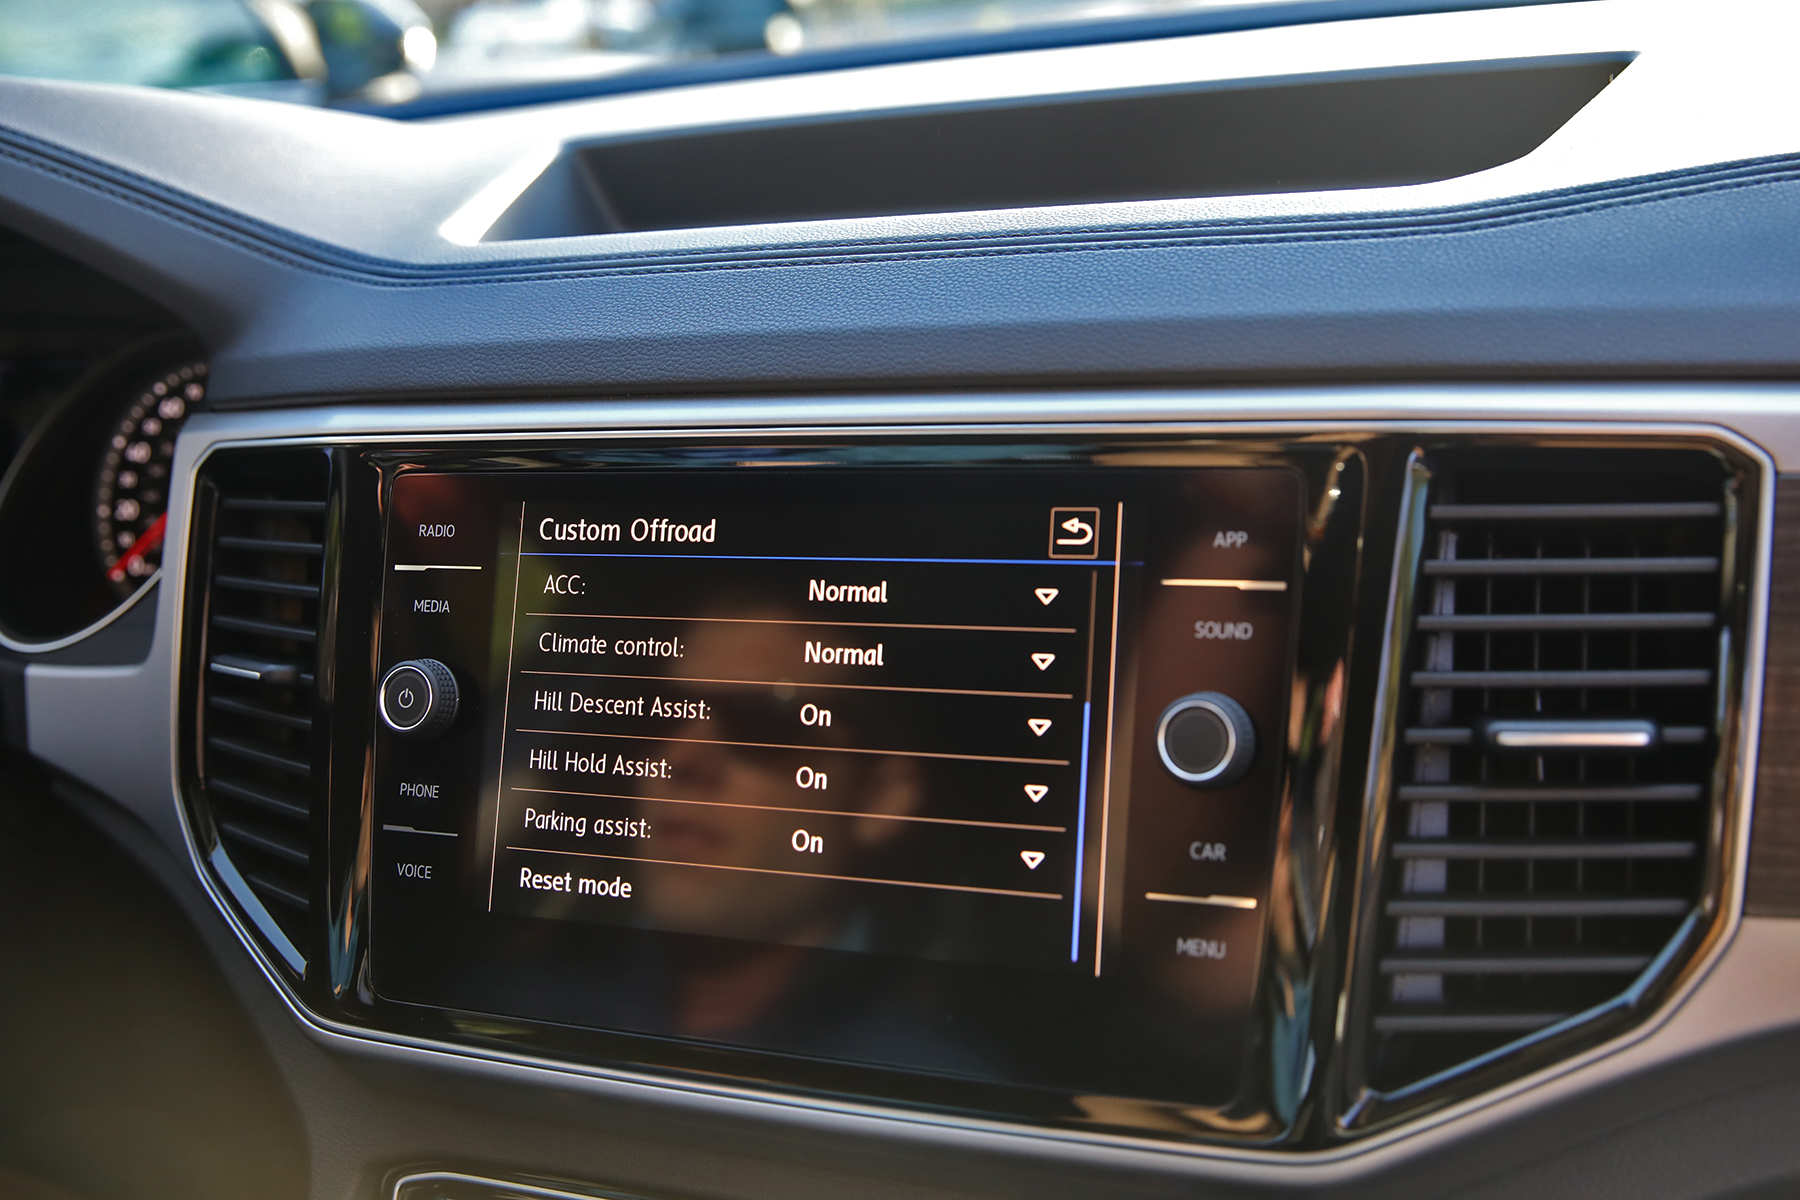 VW Atlas interior SUV drive mode display screen